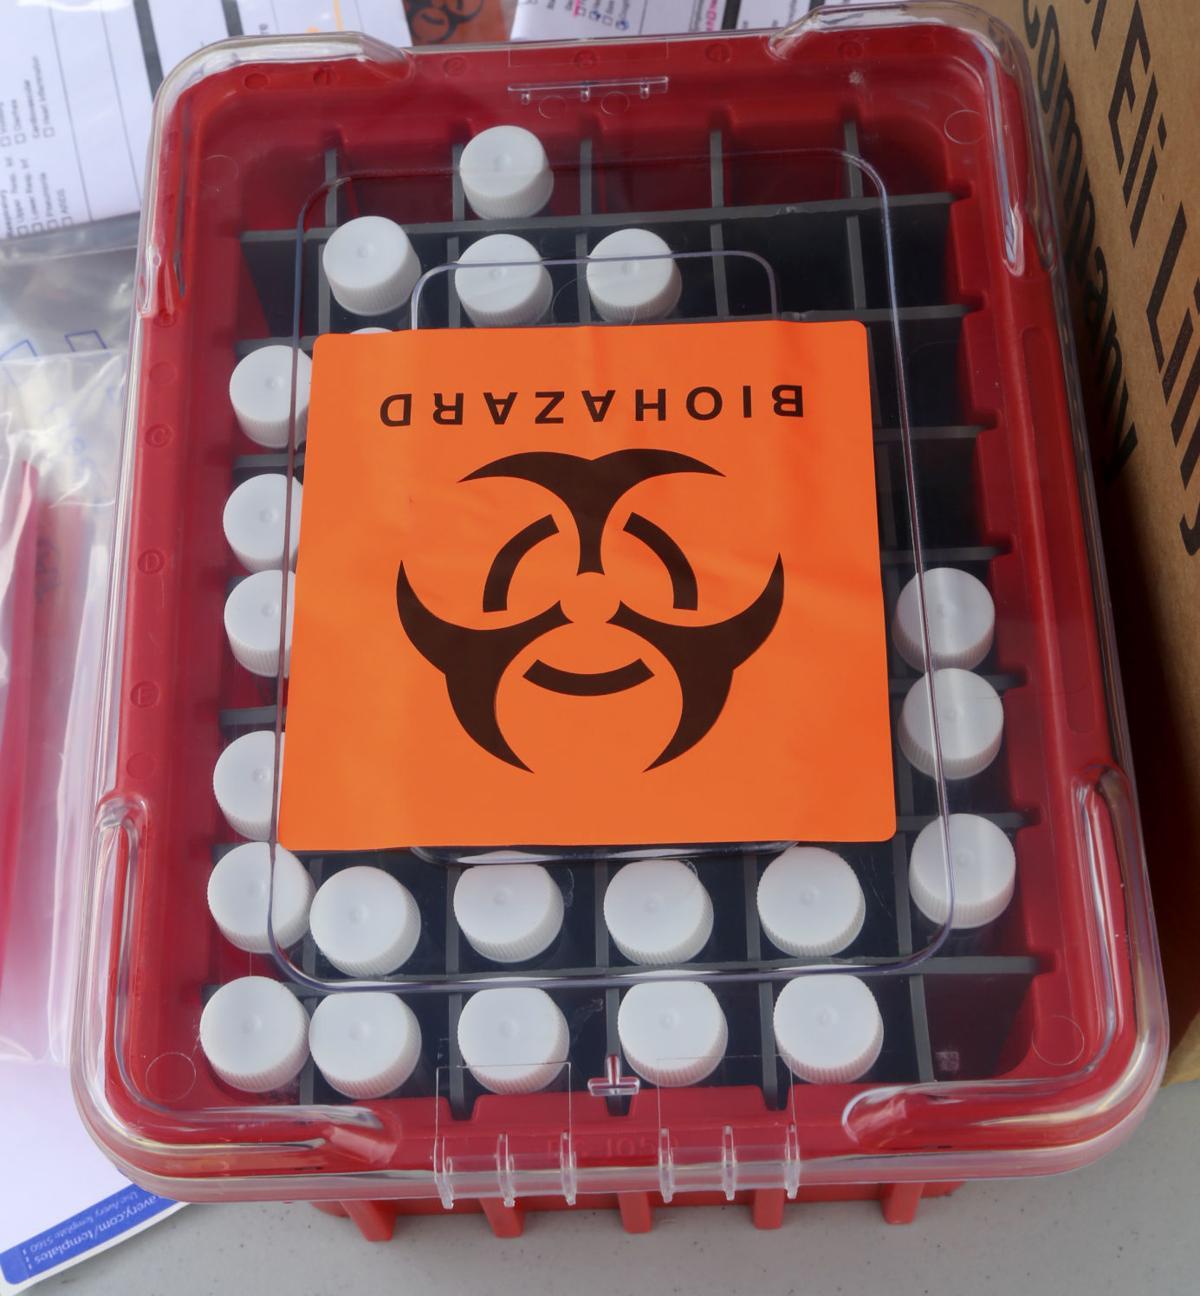 The latest on coronavirus deaths, positive cases